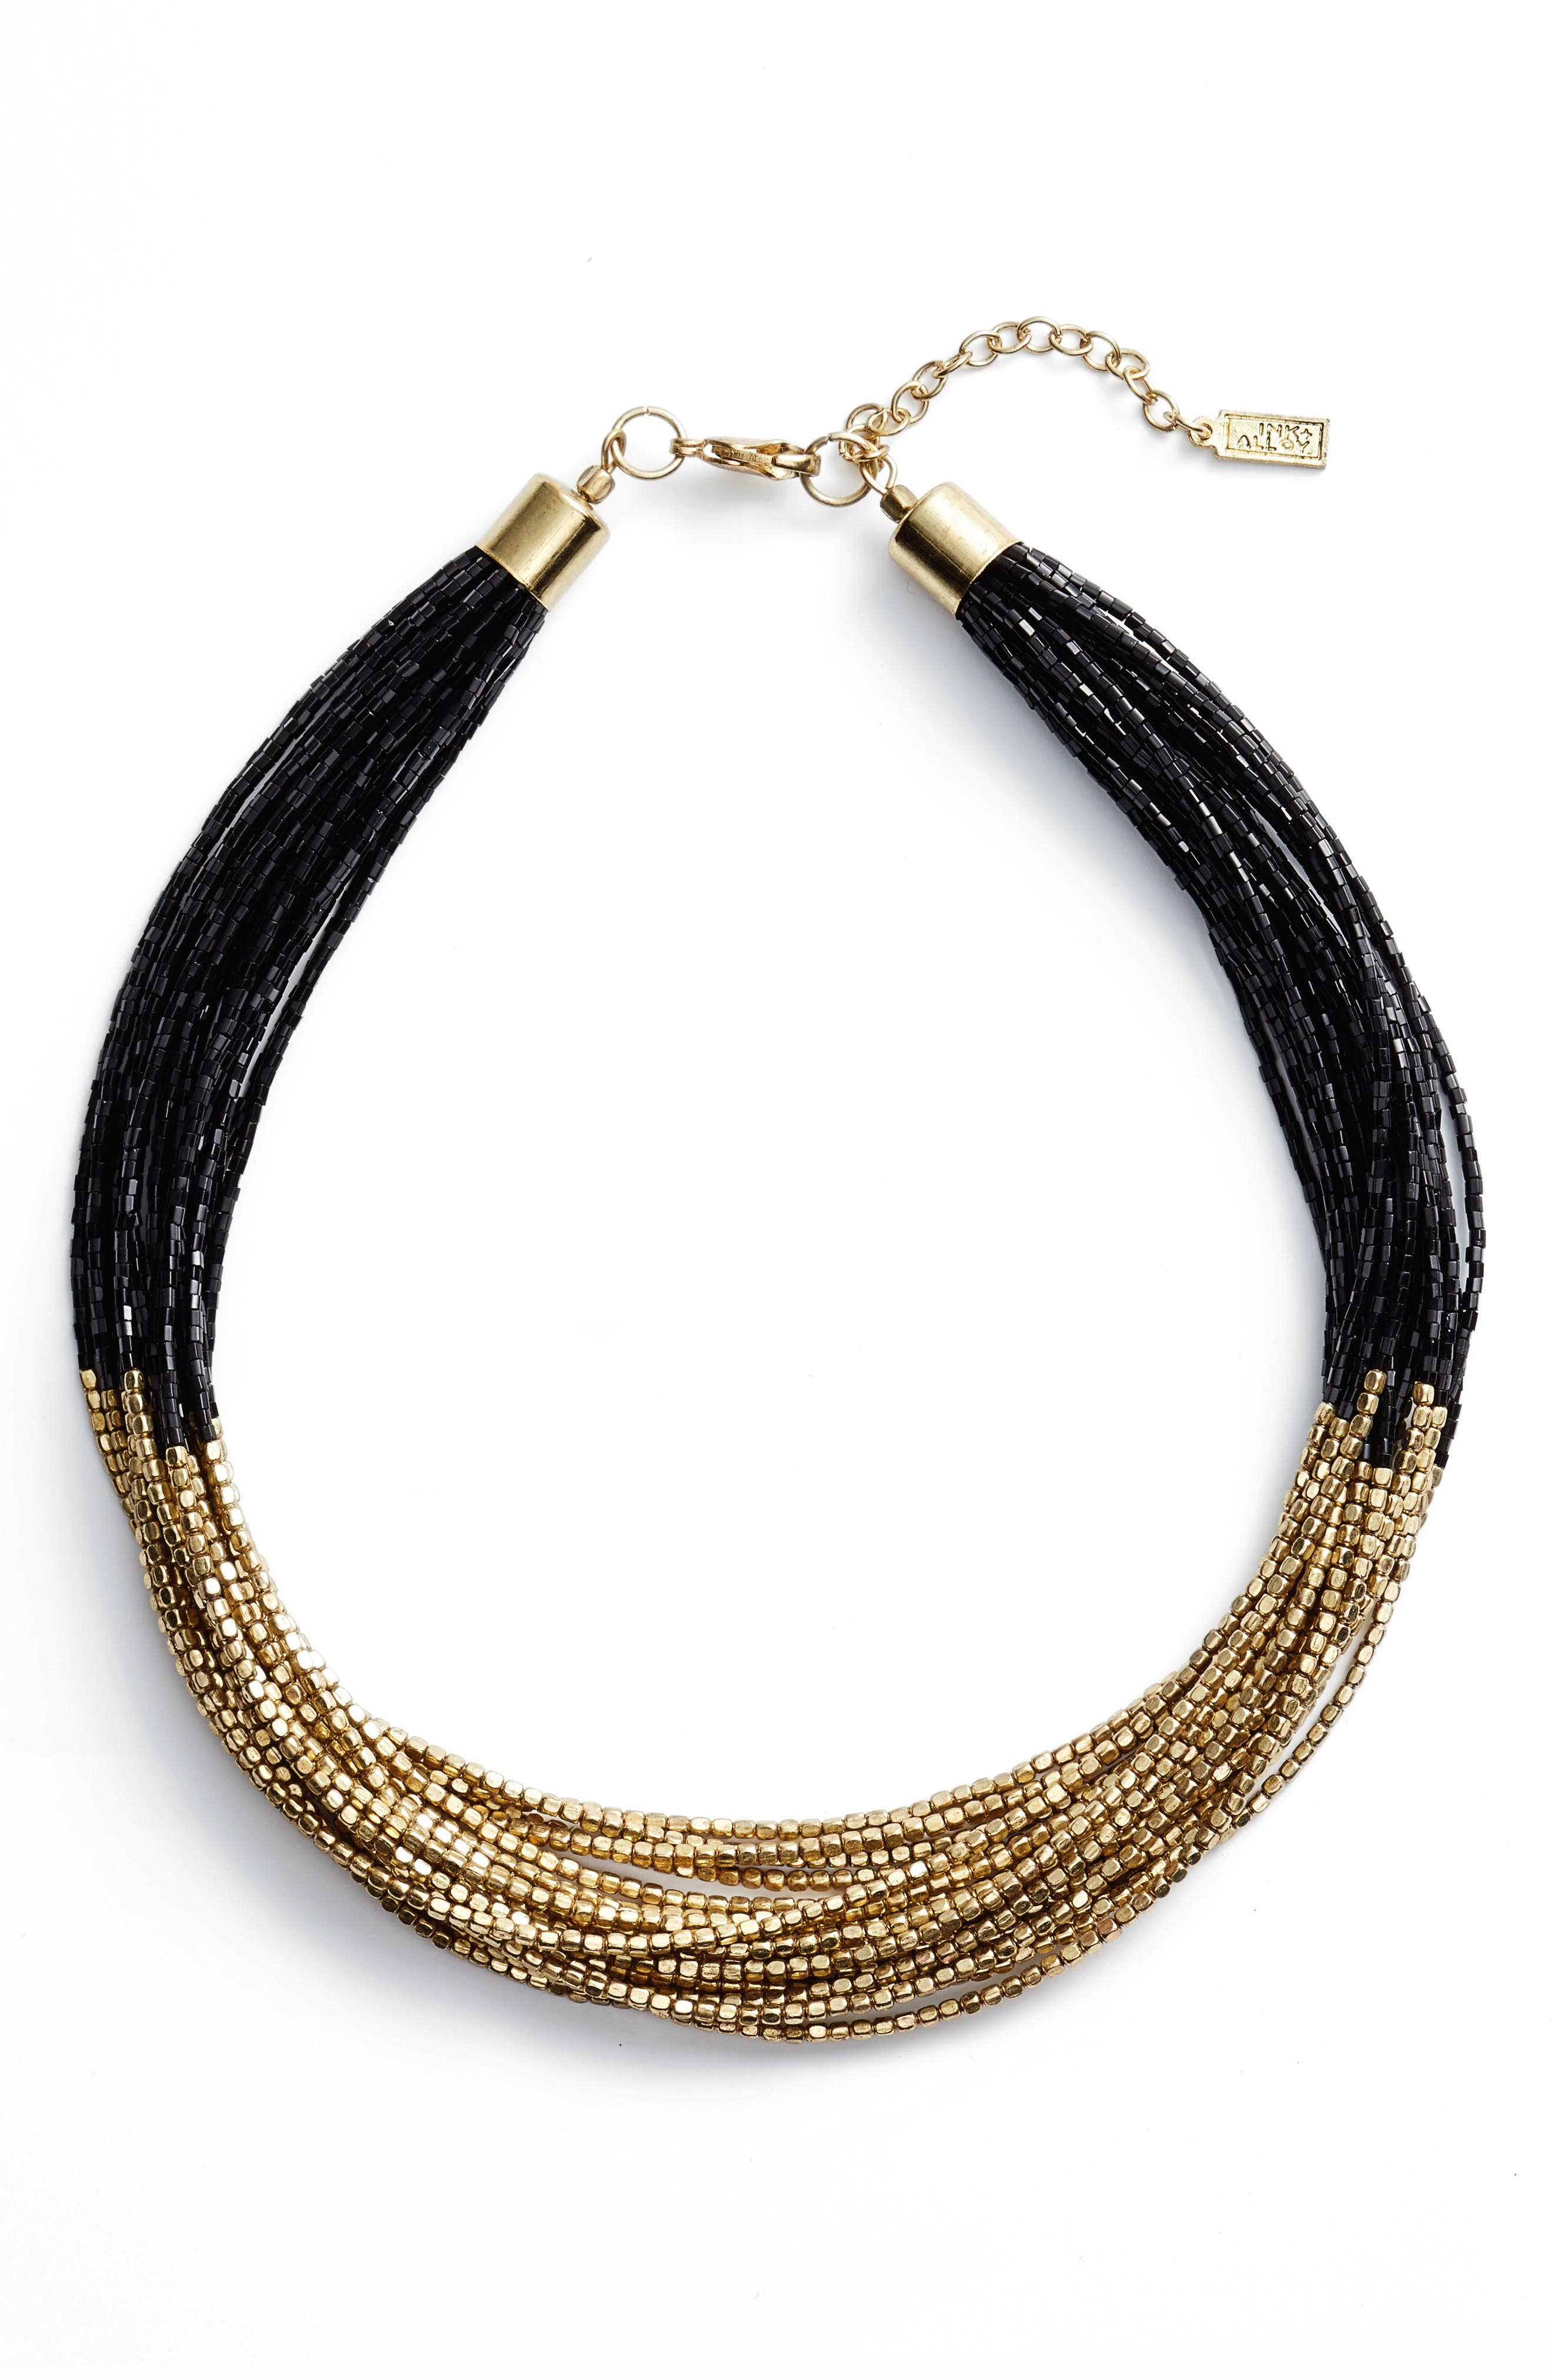 Priya Multistrand Collar Necklace,                             Main thumbnail 1, color,                             Antique Gold